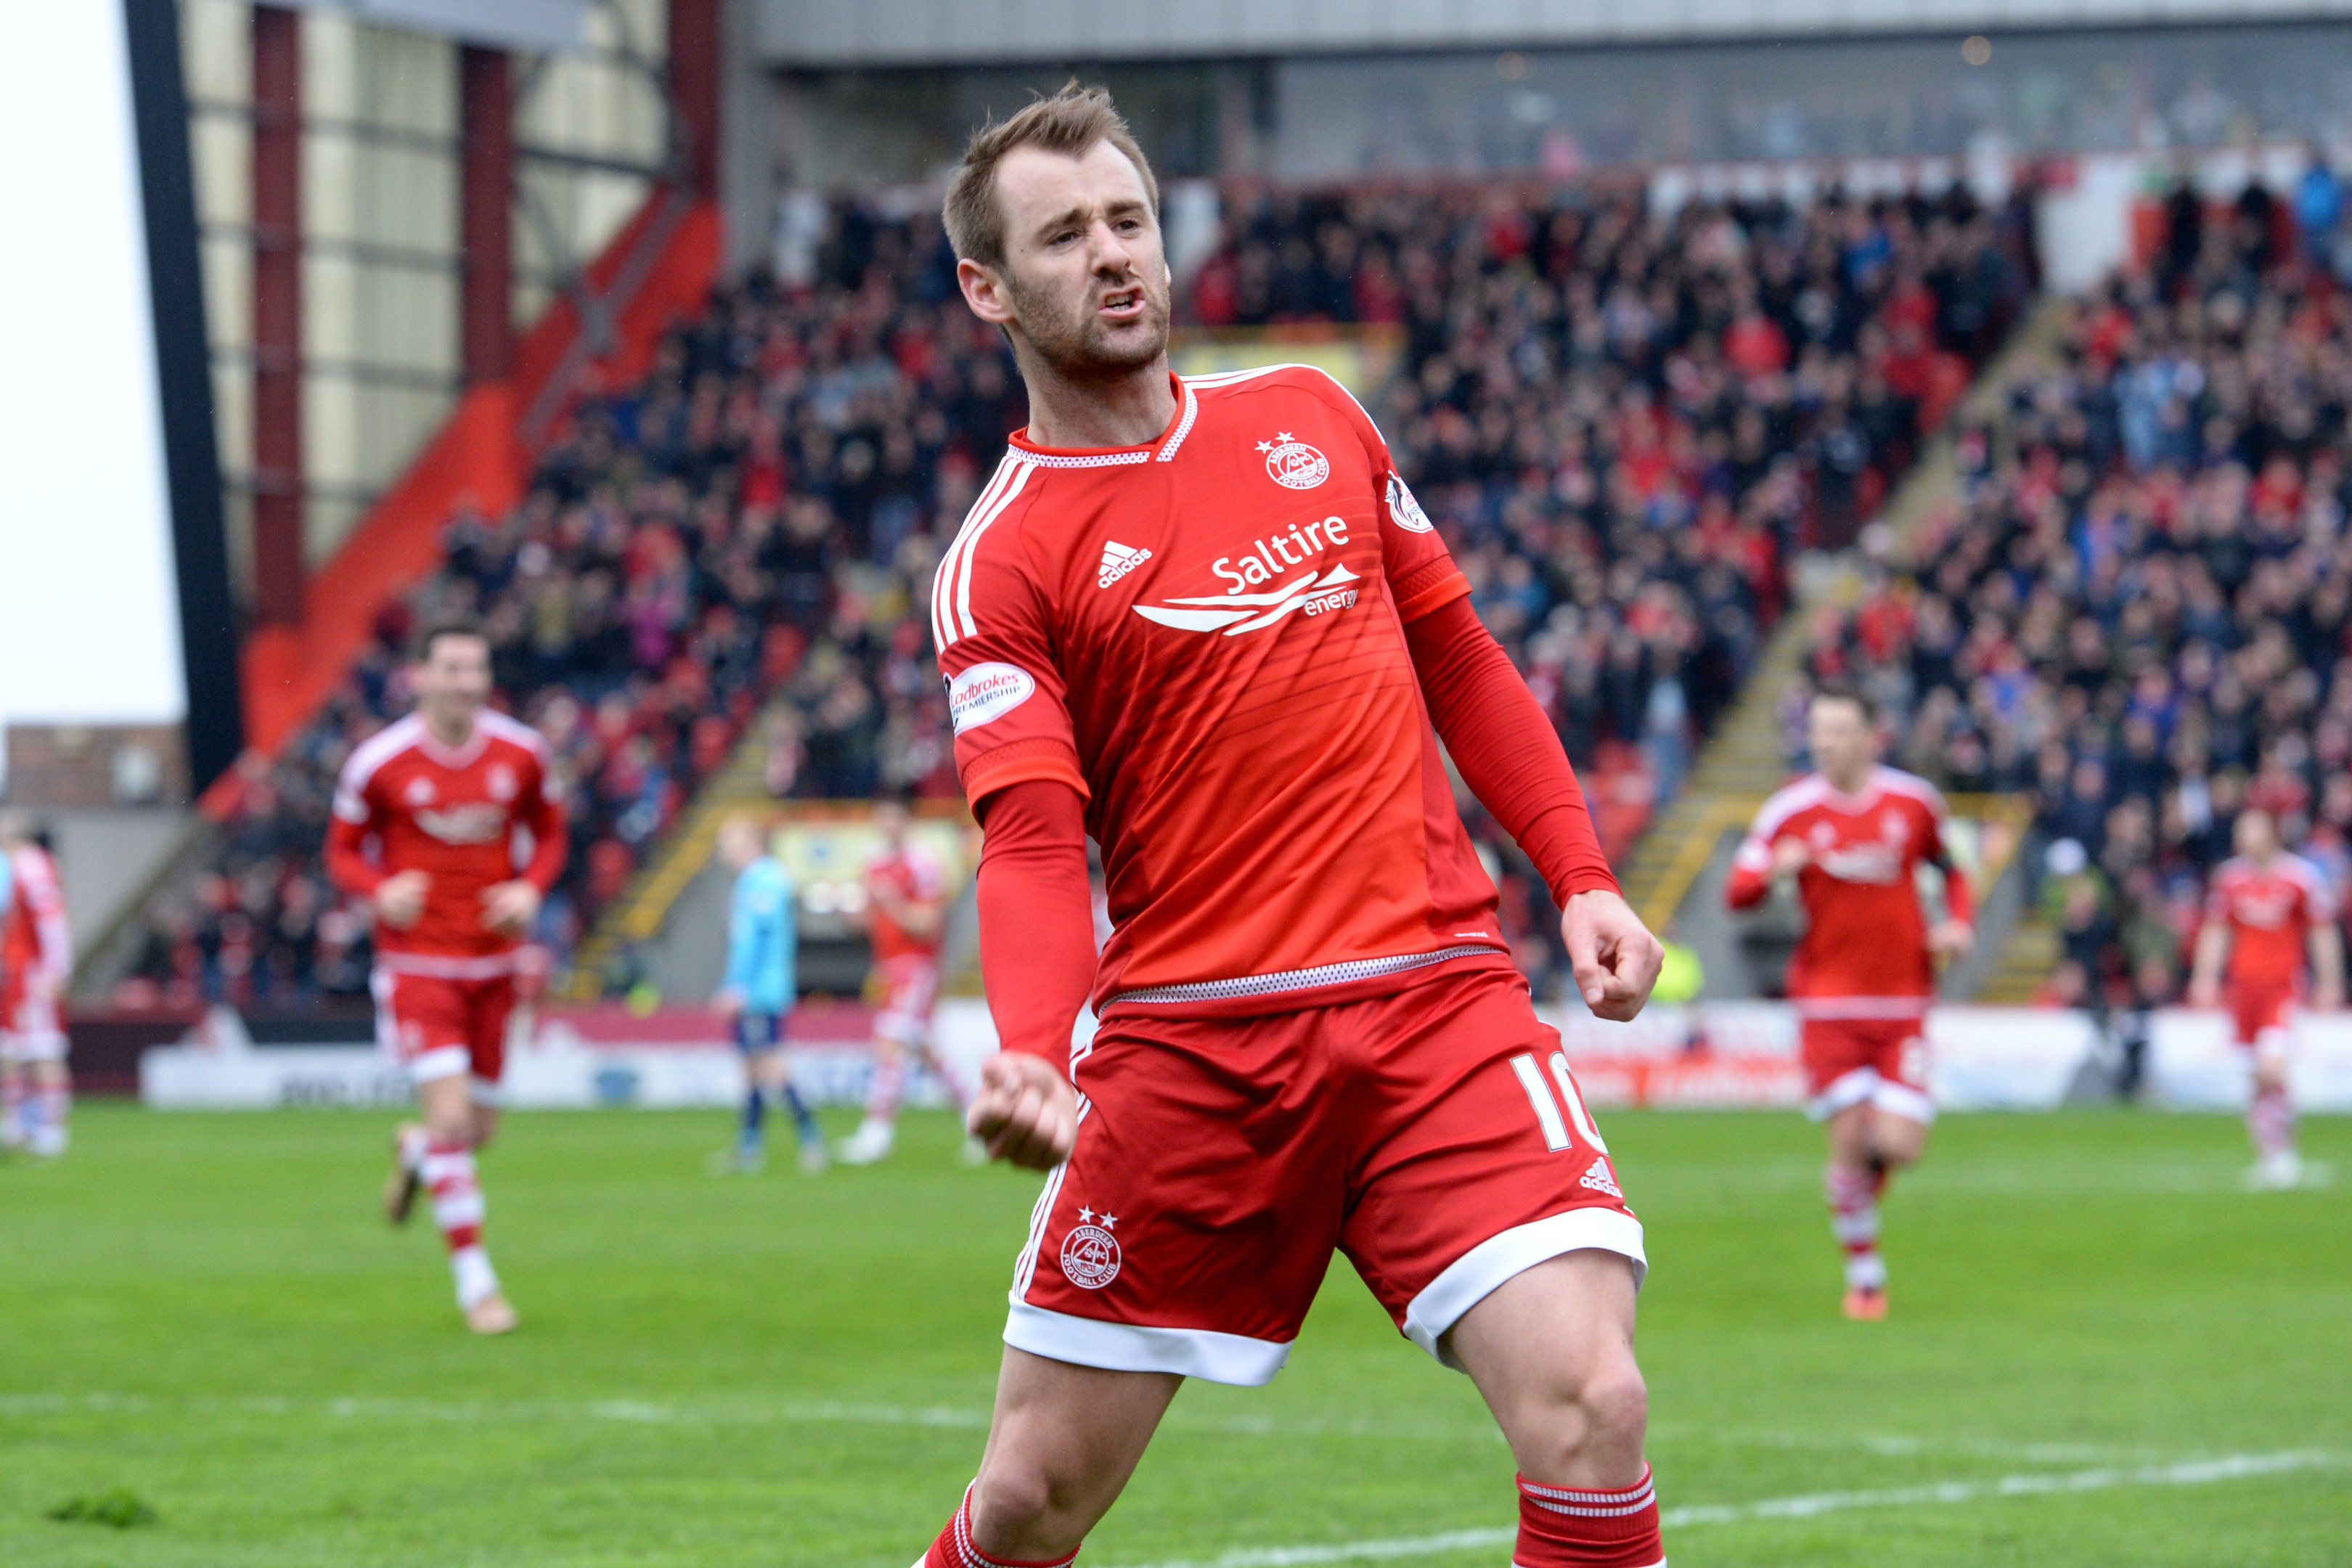 Aberdeen's Niall McGinn scored in the win for Northern Ireland.